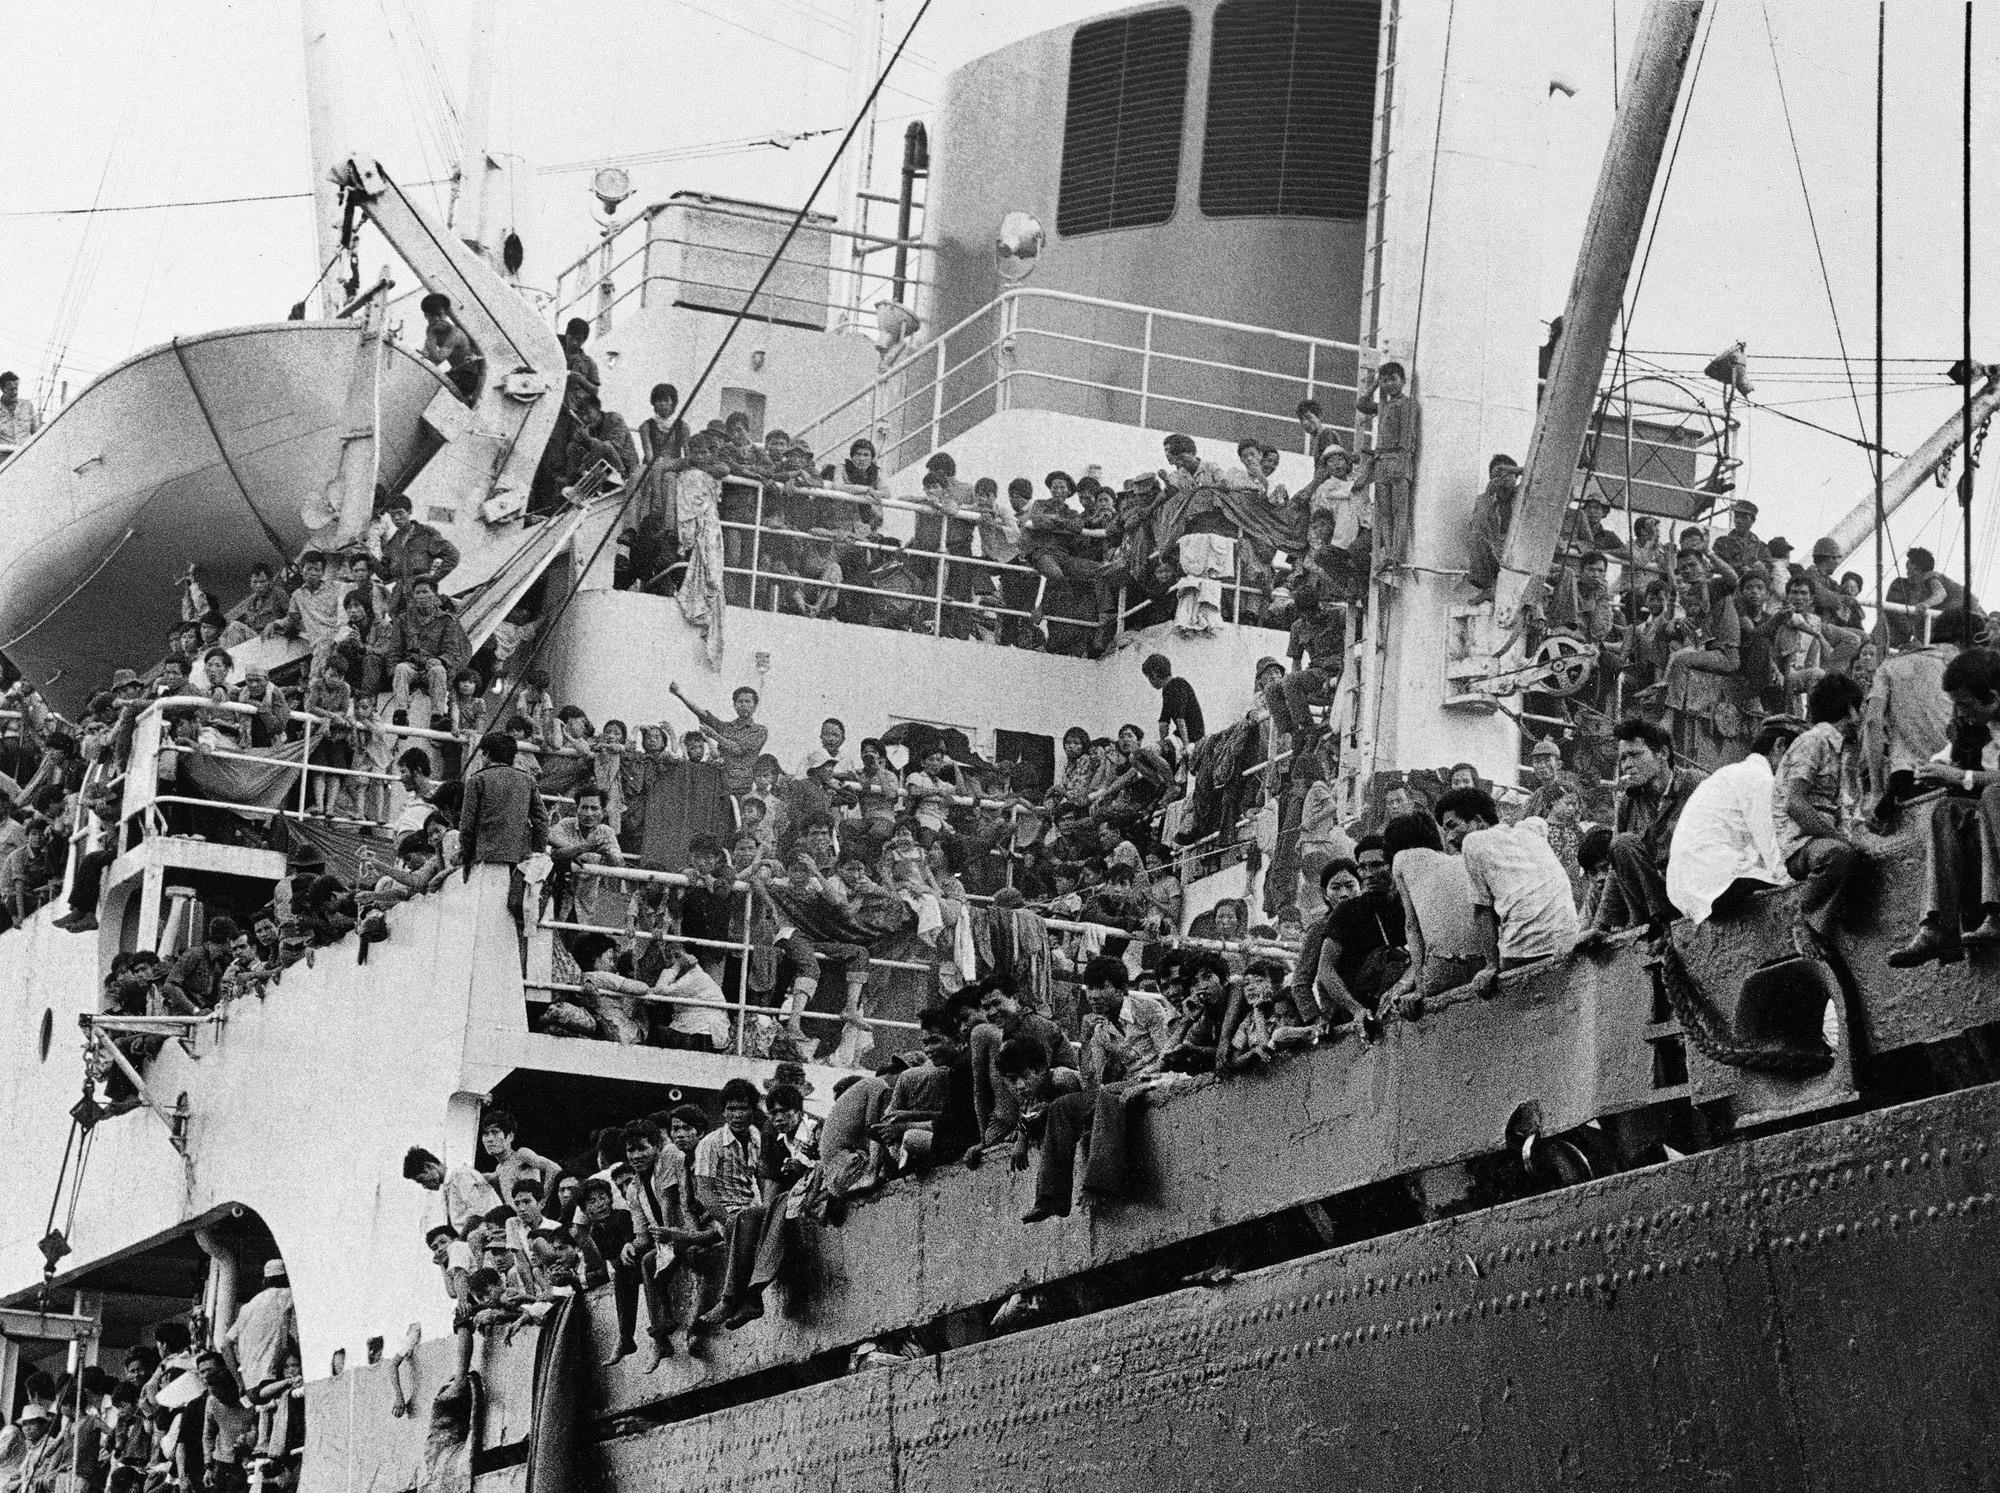 Вьетнамские беженцы столпились на борту корабля